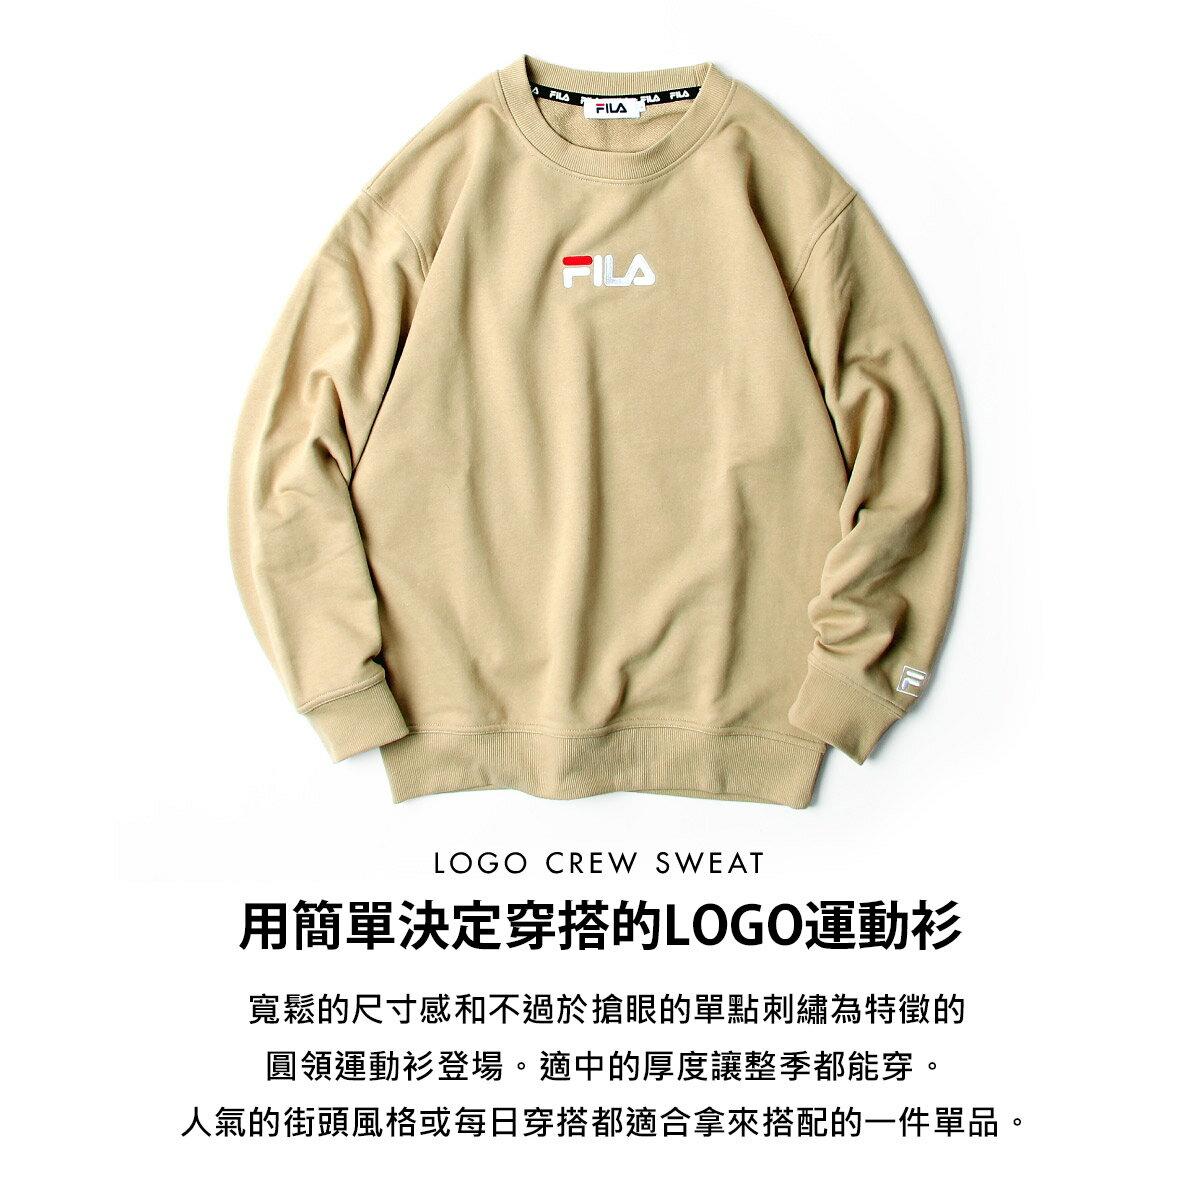 【FILA】單點LOGO刺繡圓領運動衫 3